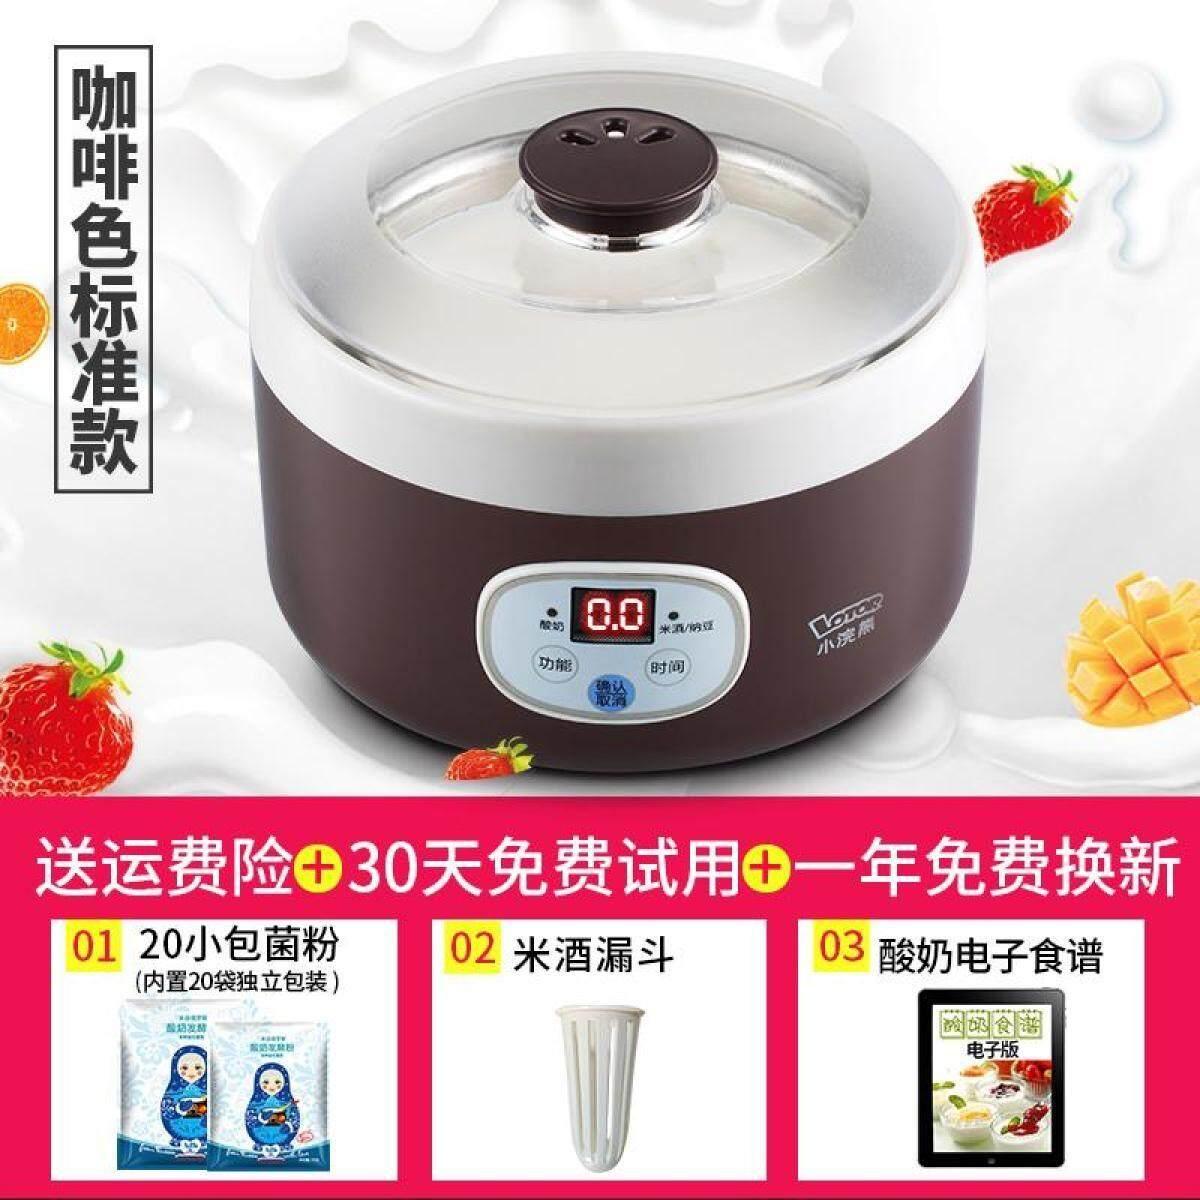 Raccoon TW-303A Homemade Yogurt Machine Household Automatic Power-Off Multifunction Mini Fermentation Cup Rice Wine